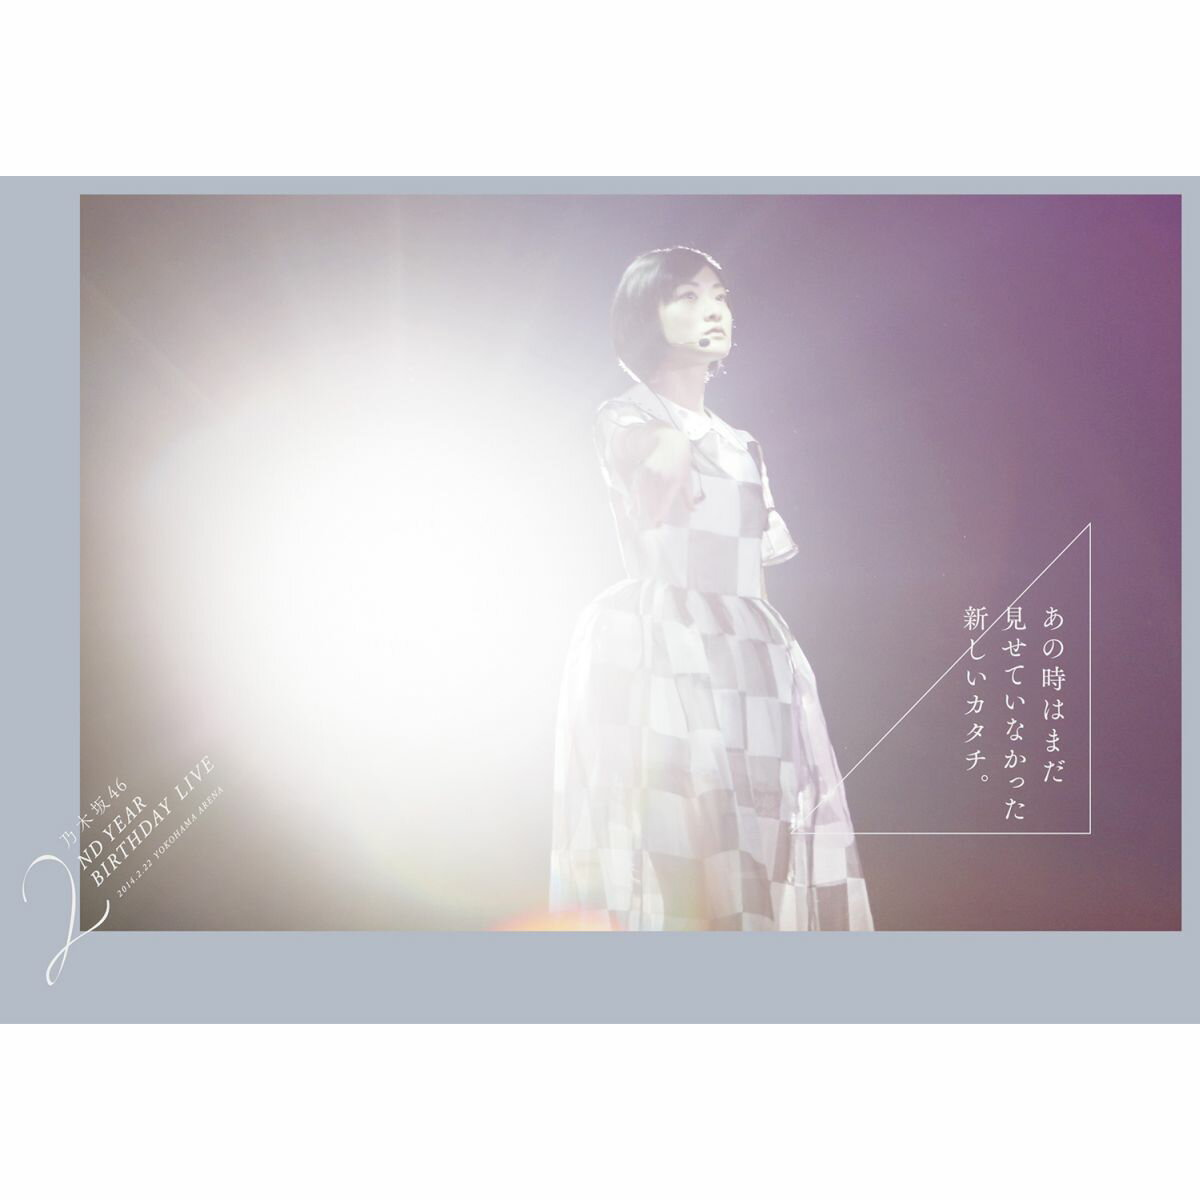 乃木坂46 2ND YEAR BIRTHDAY LIVE 2014.2.22 YOKOHAMA ARENA 【完全生産限定盤】 [ 乃木坂46 ]